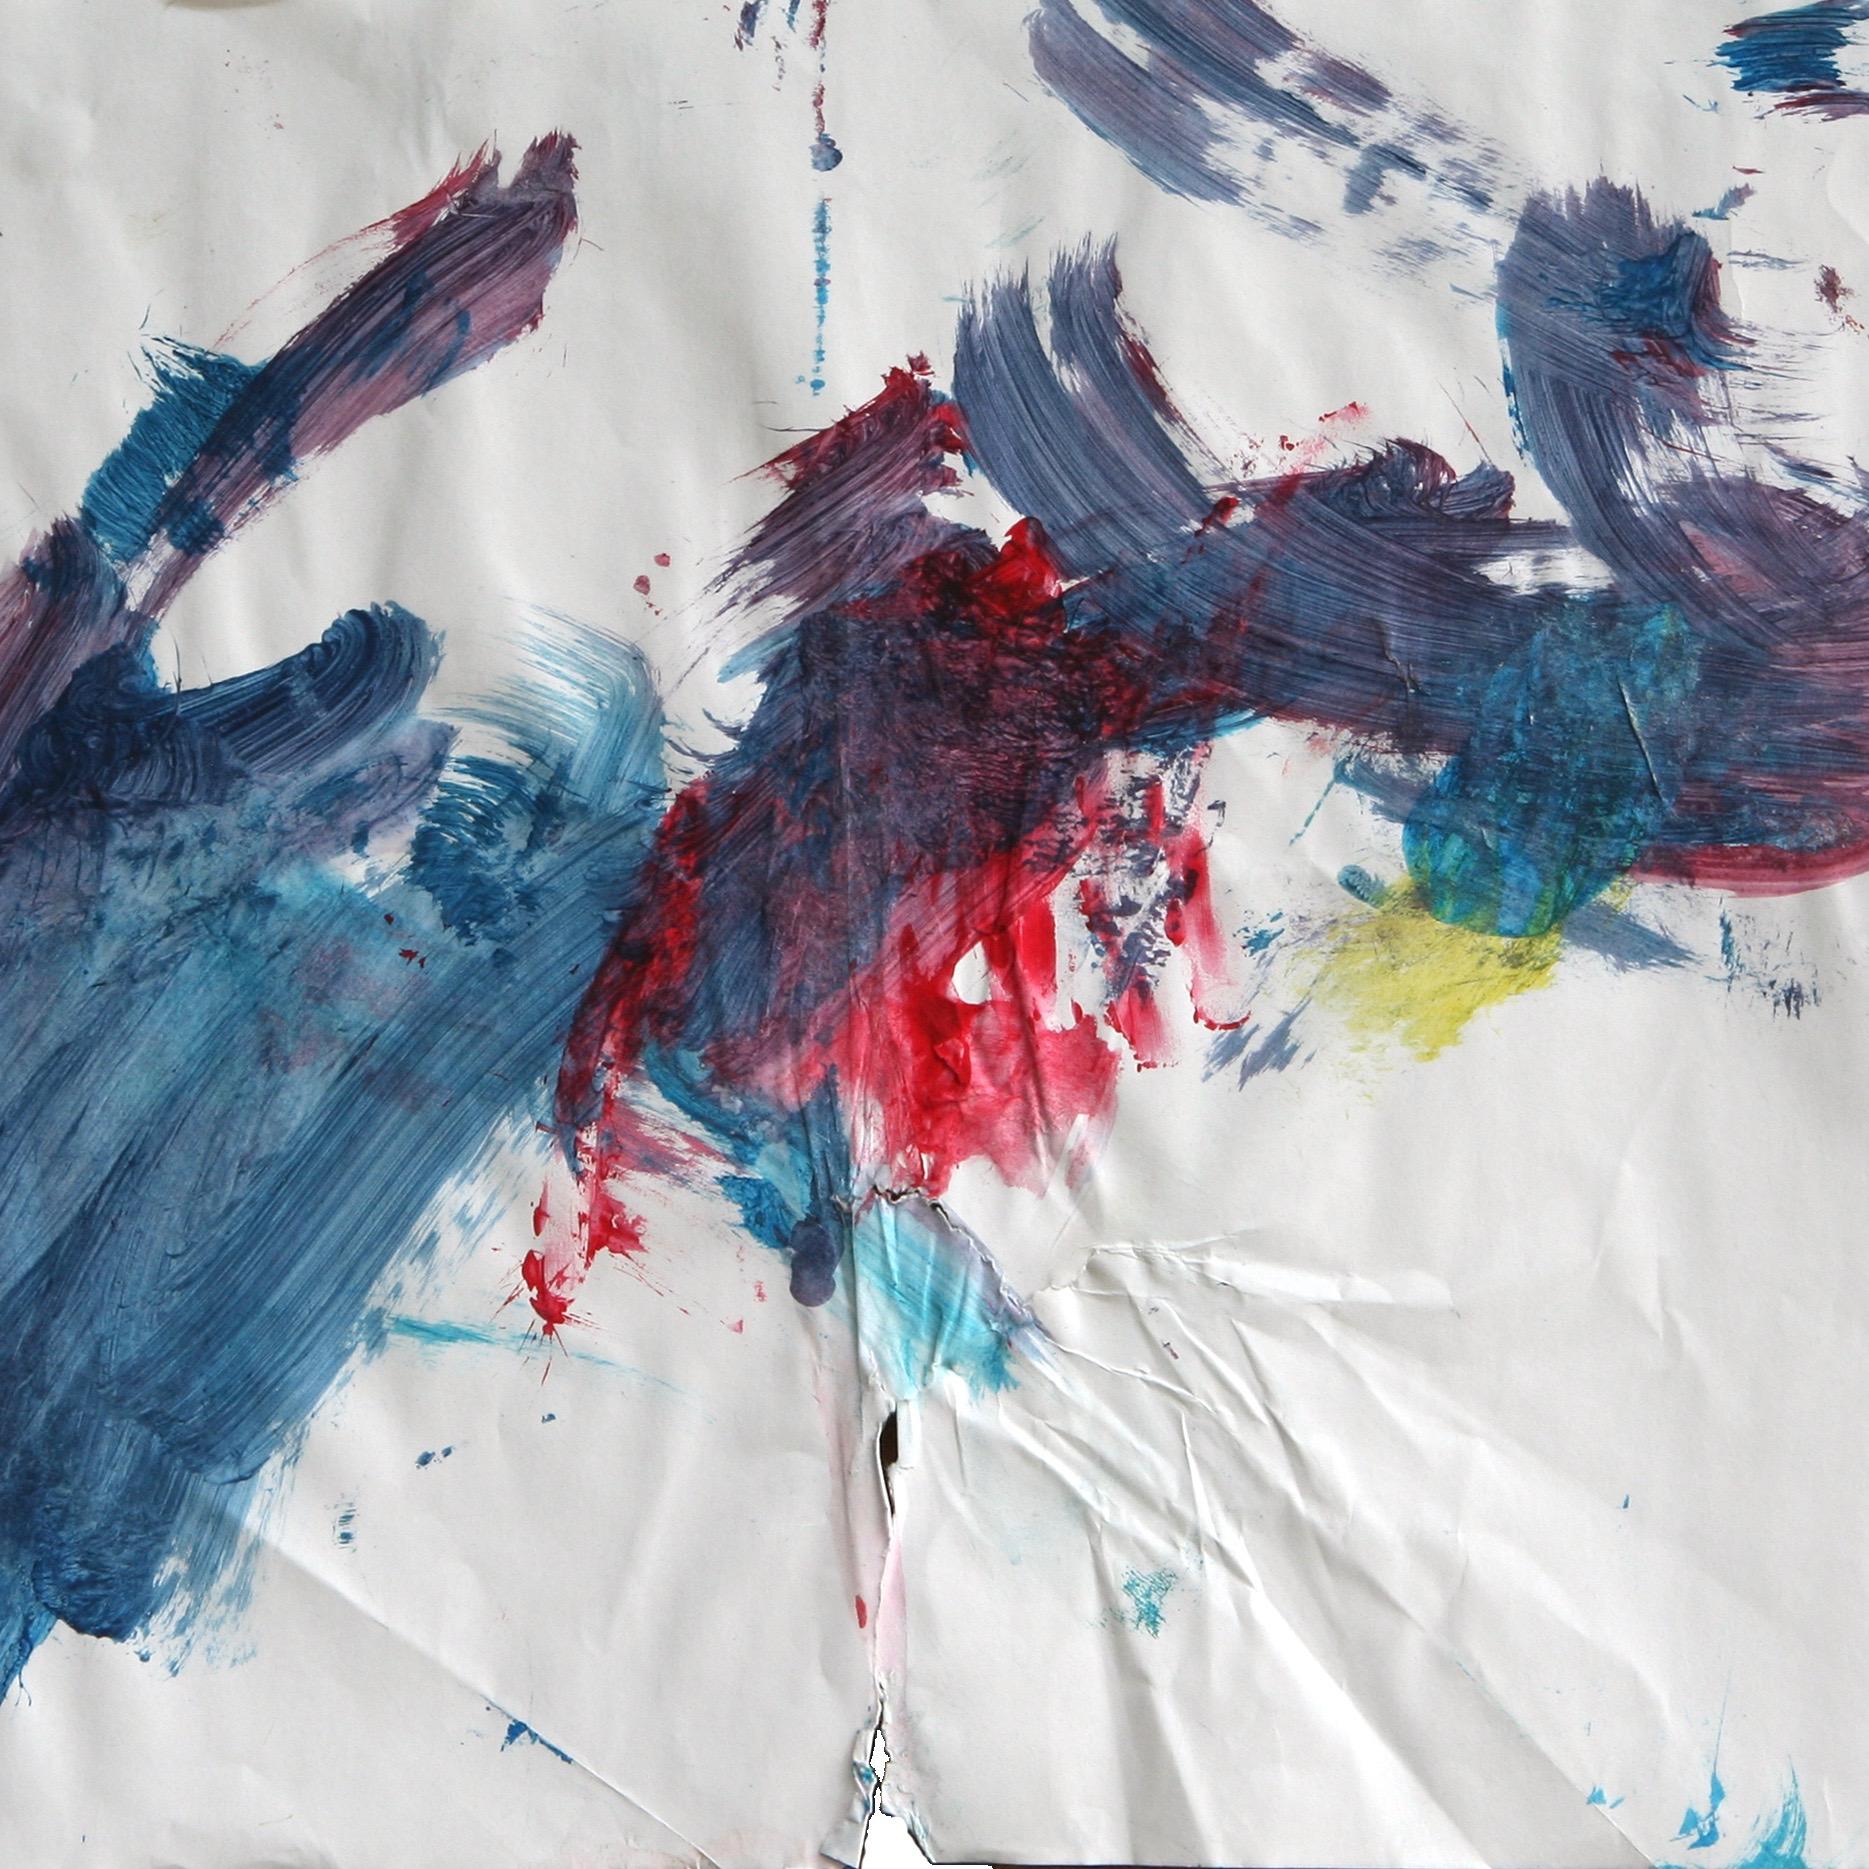 Sandra 0116, 2006, Fingerfarbe auf Papier, 42 x 56 cm